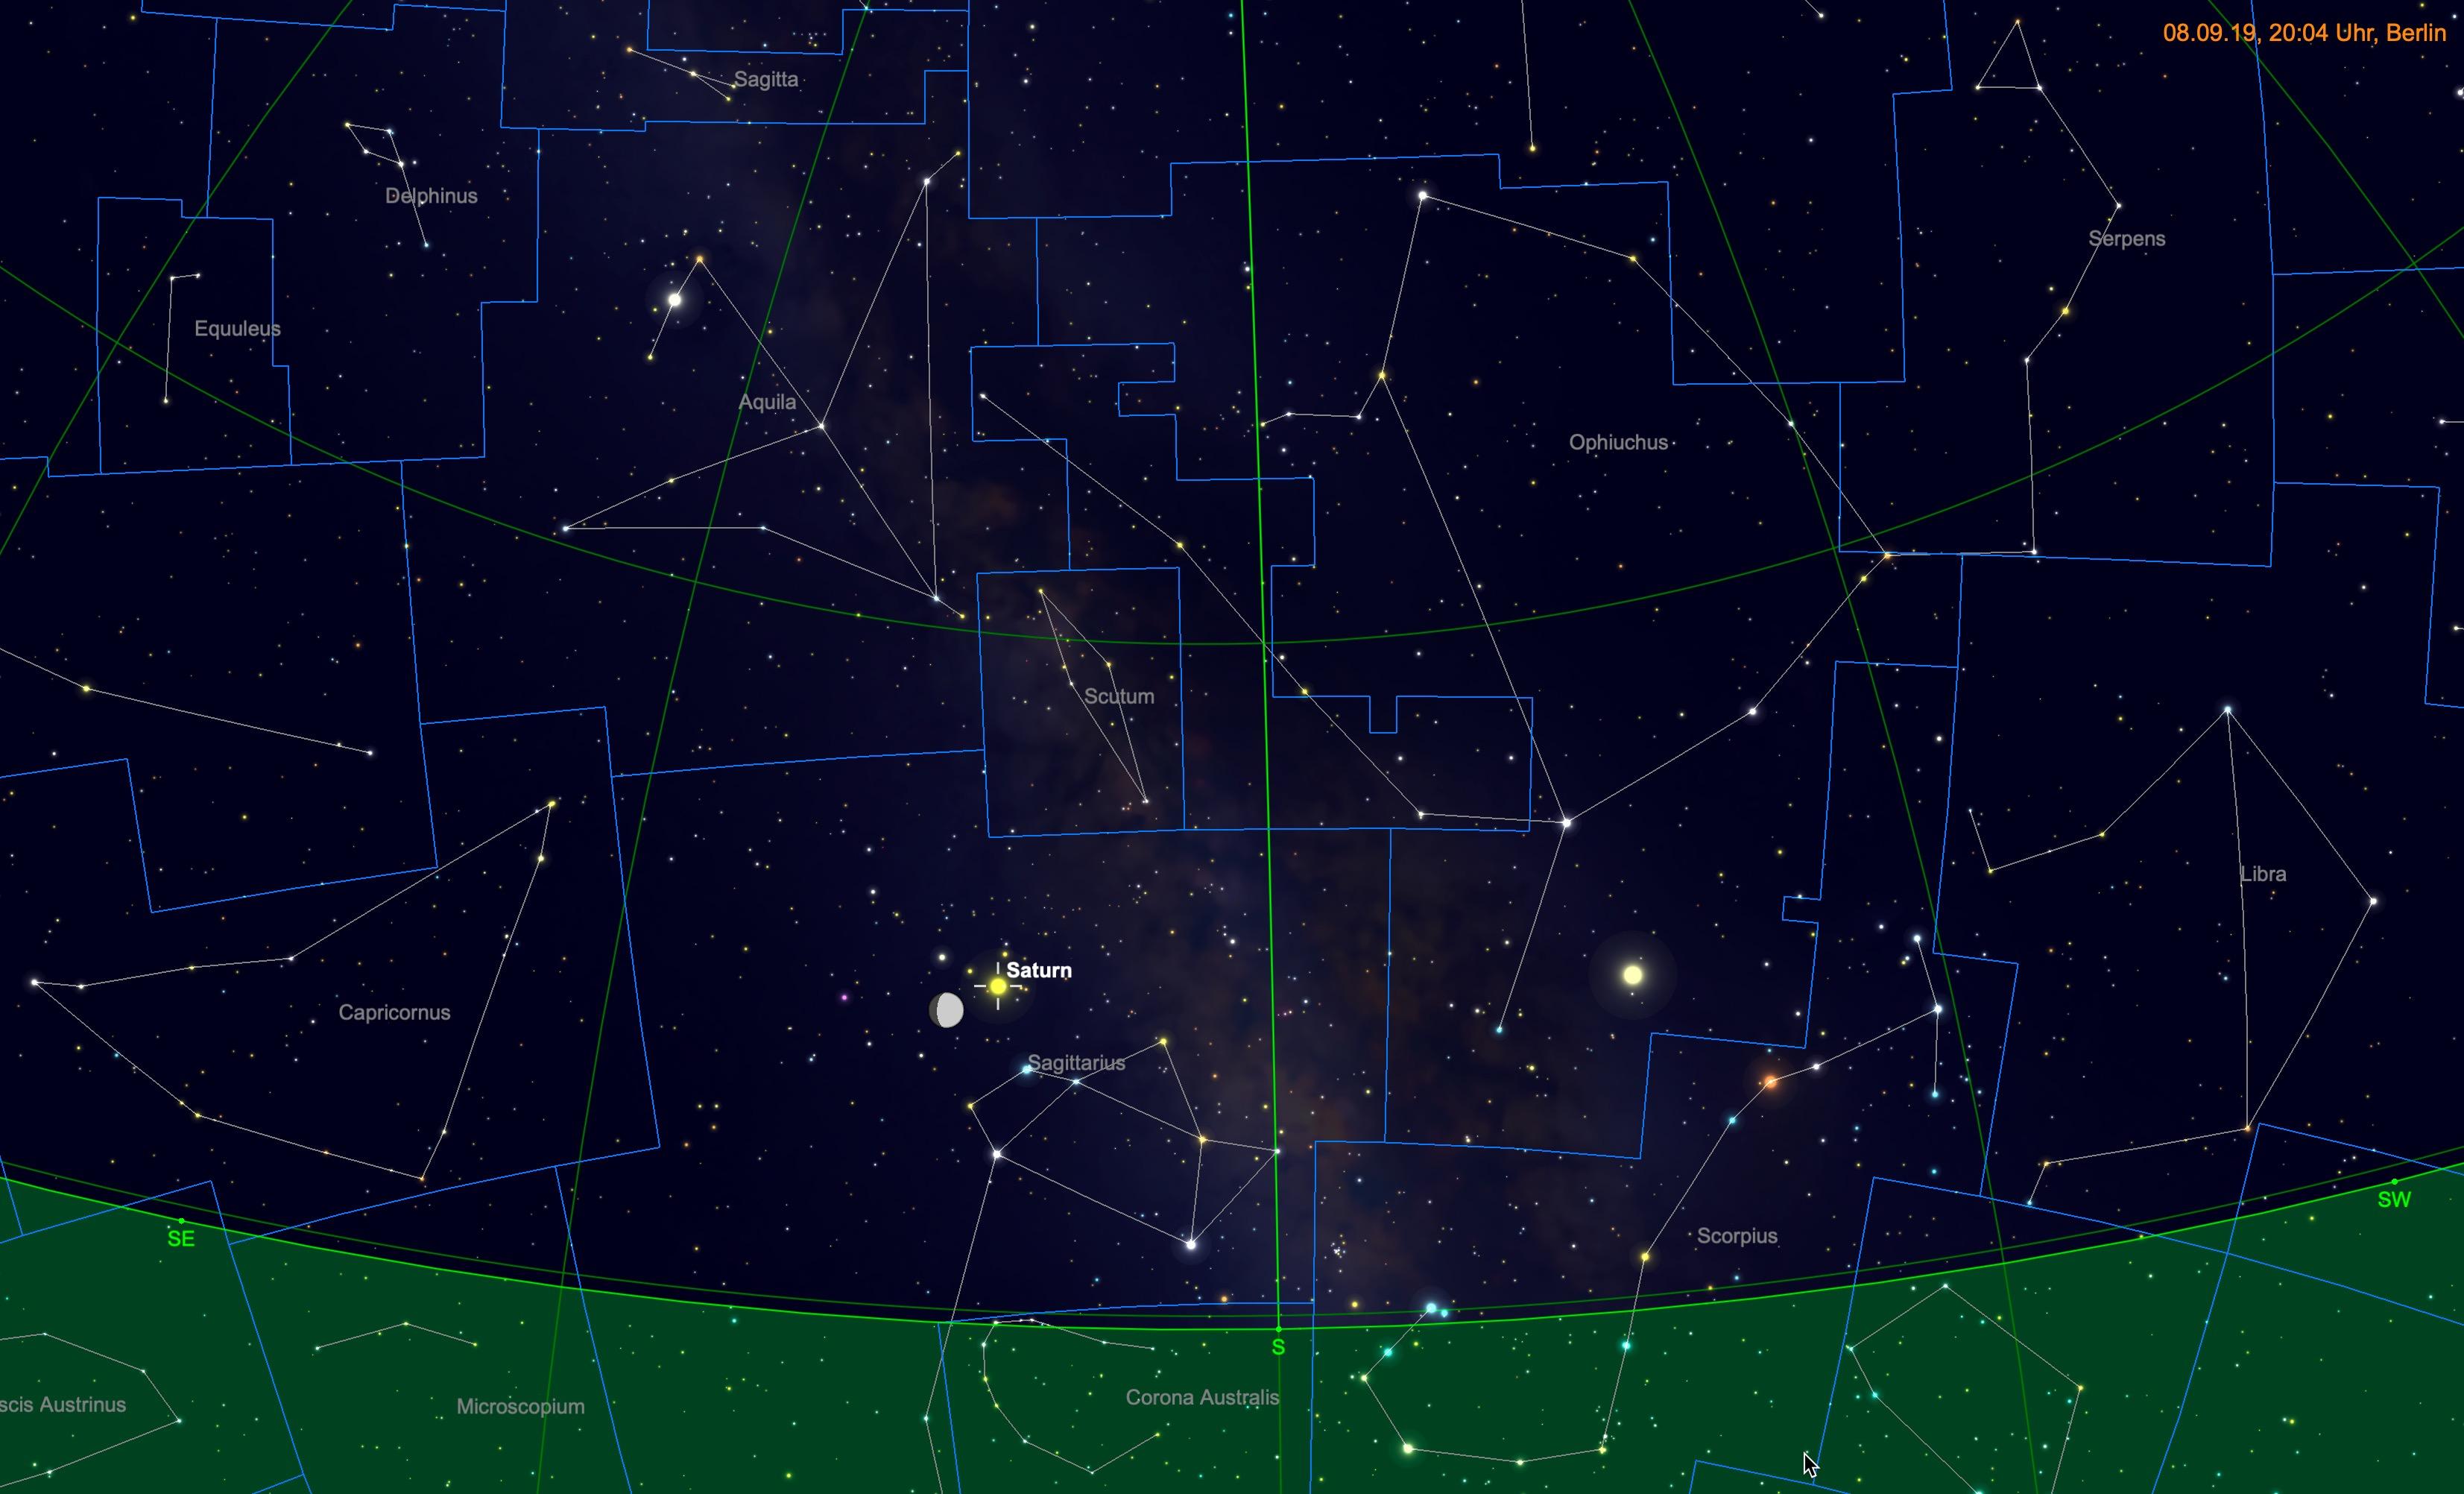 Ariane Walkthrough Sterne